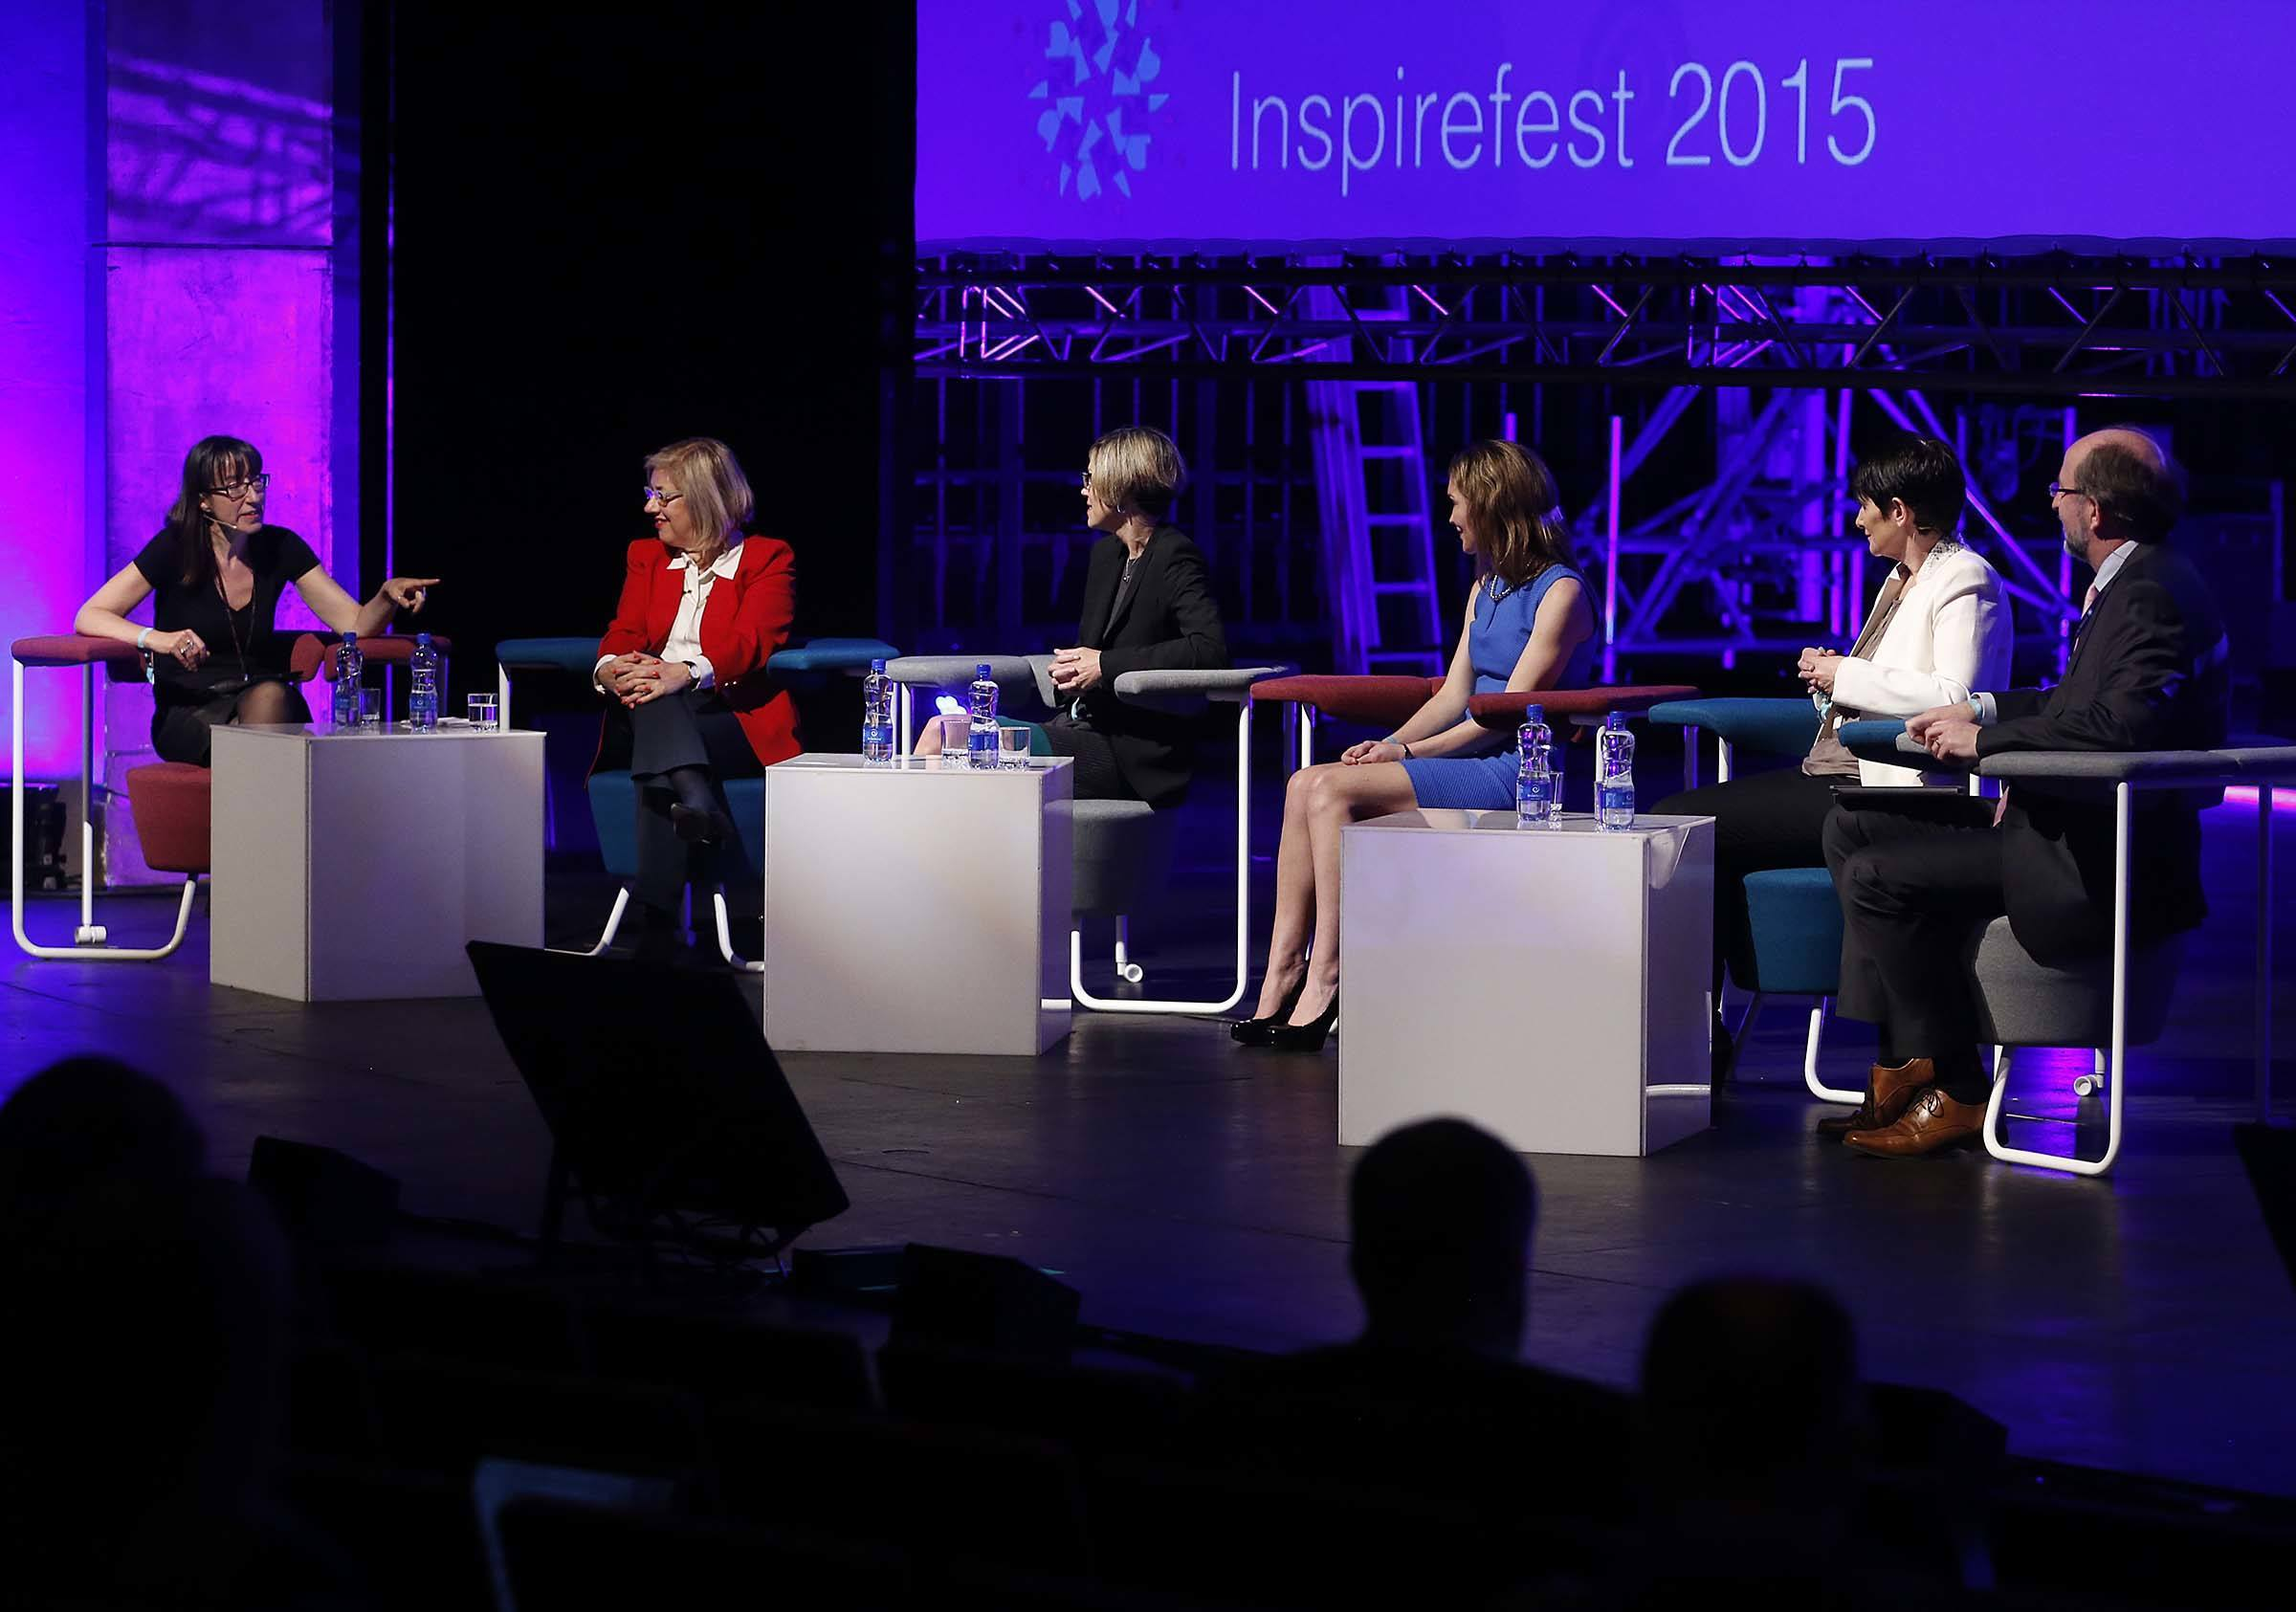 Leadership Panel: (l-r) Ann O'Dea; Shelly Porges; Bethany Mayer; Margaret Burgraff; Carolan Lennon; Prof Brian MacCraith